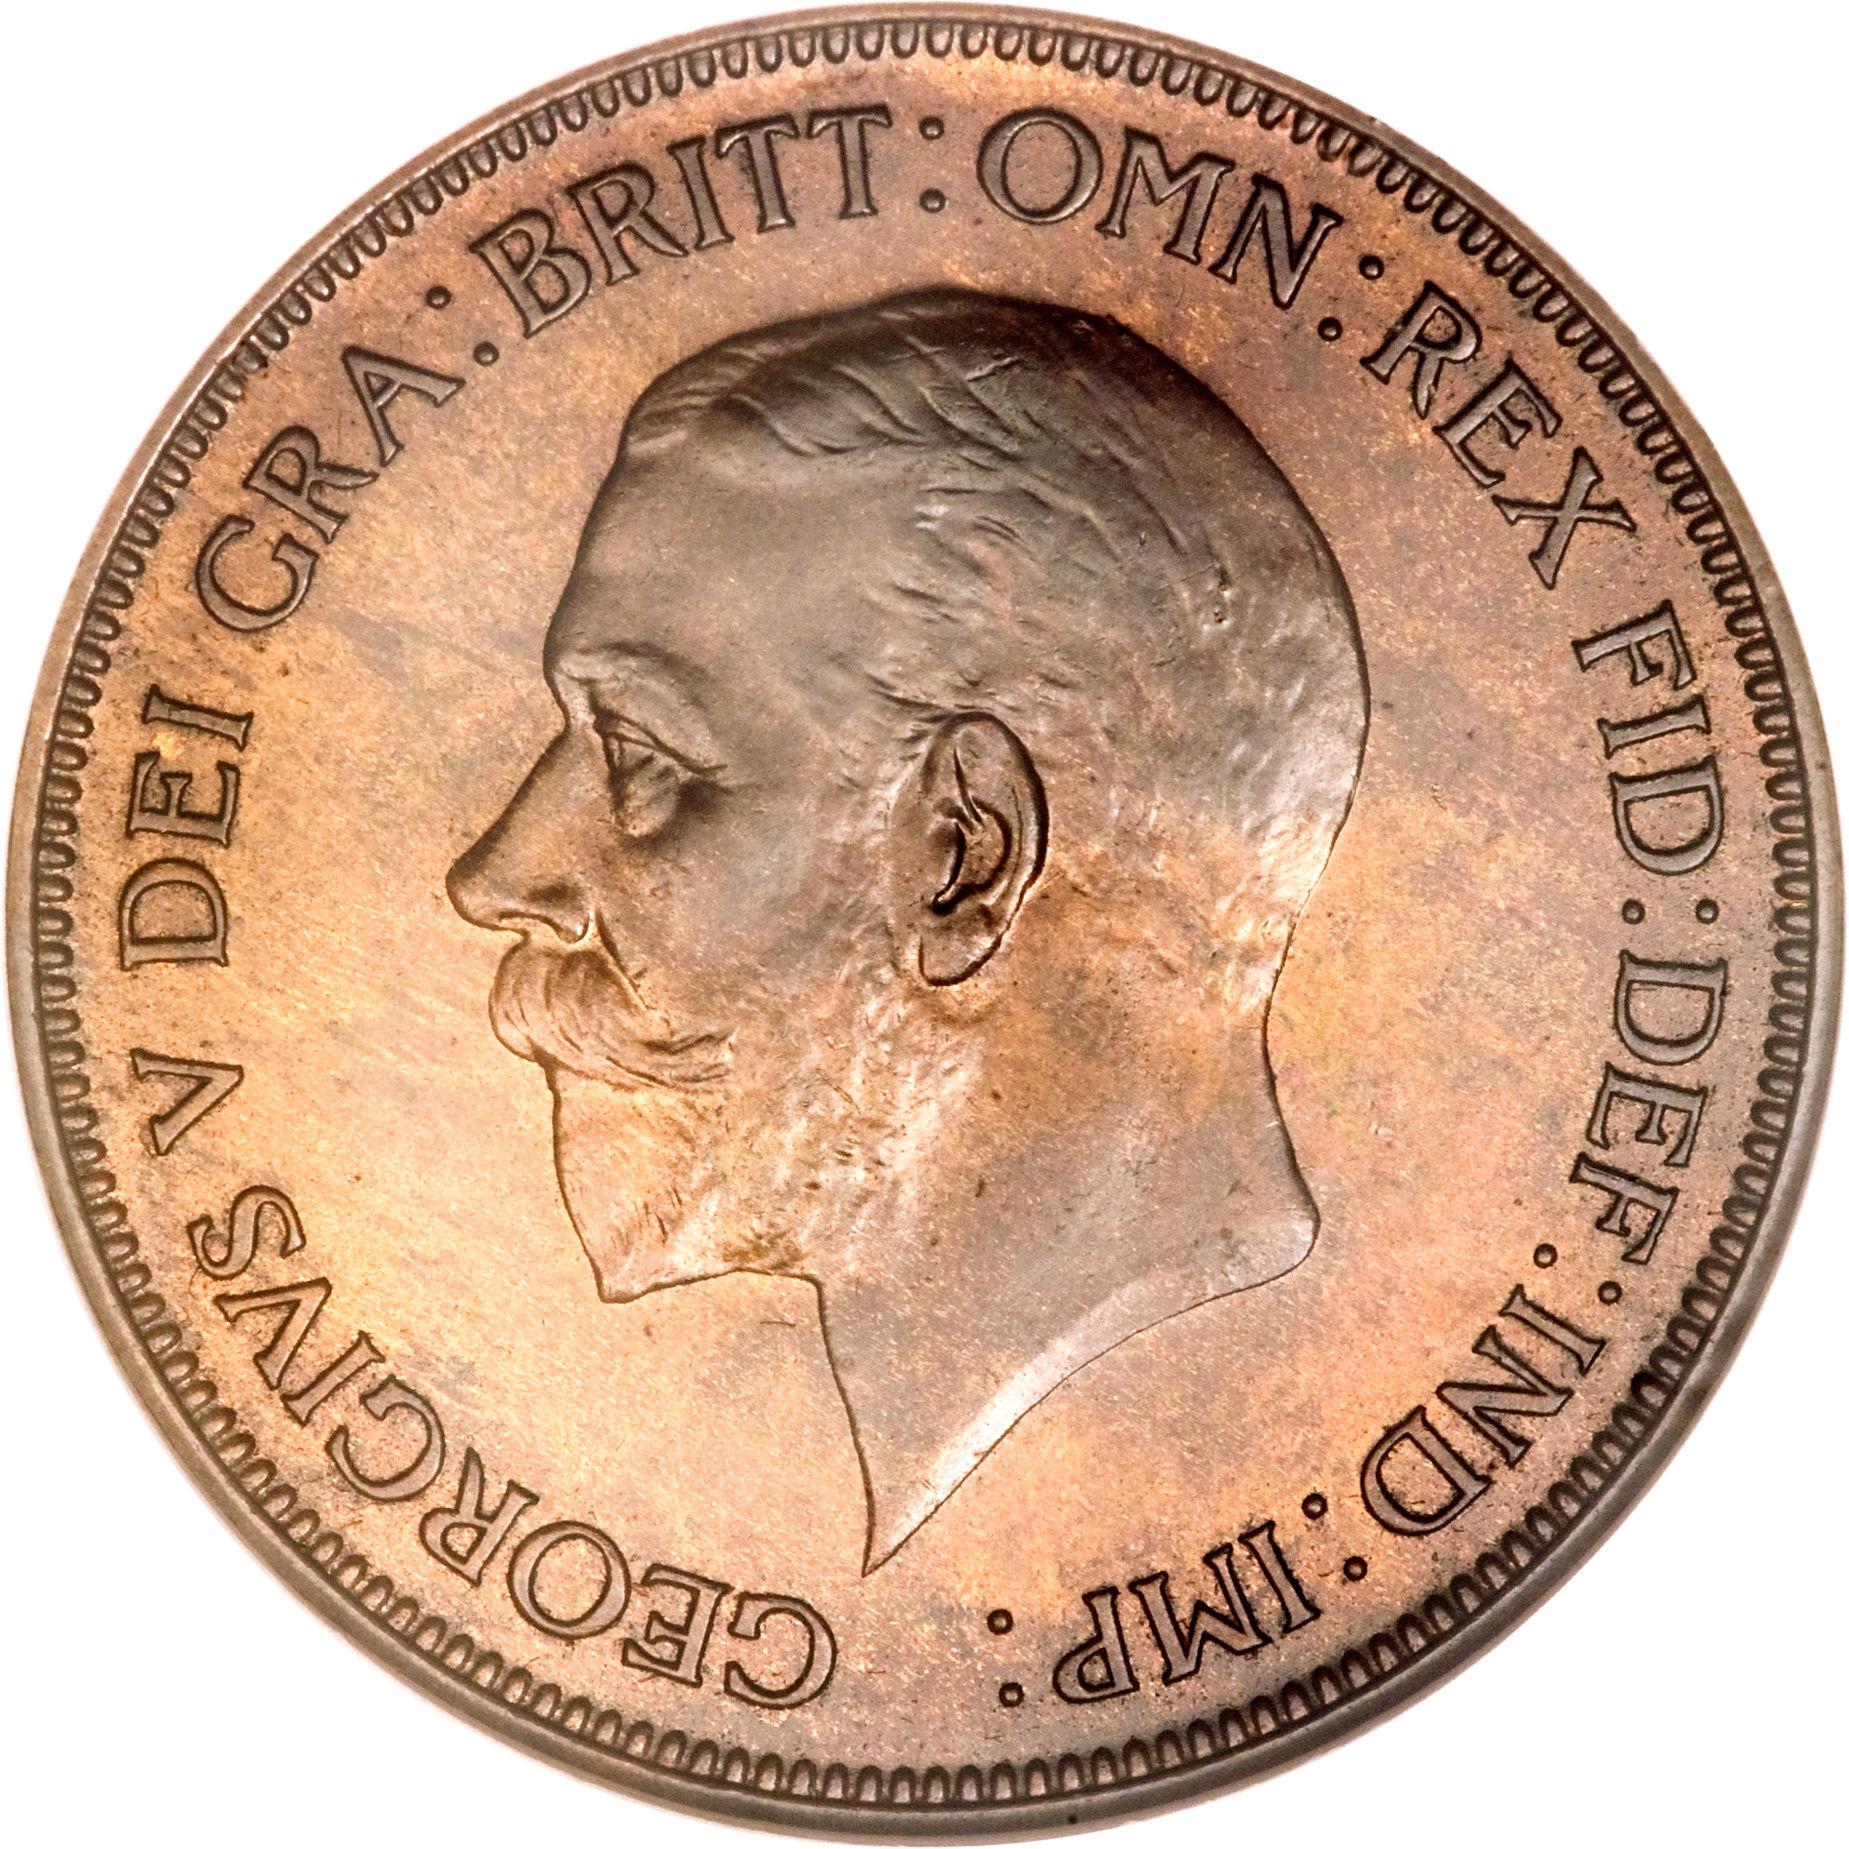 1 penny george v 2e effigie petite t te royaume uni numista. Black Bedroom Furniture Sets. Home Design Ideas